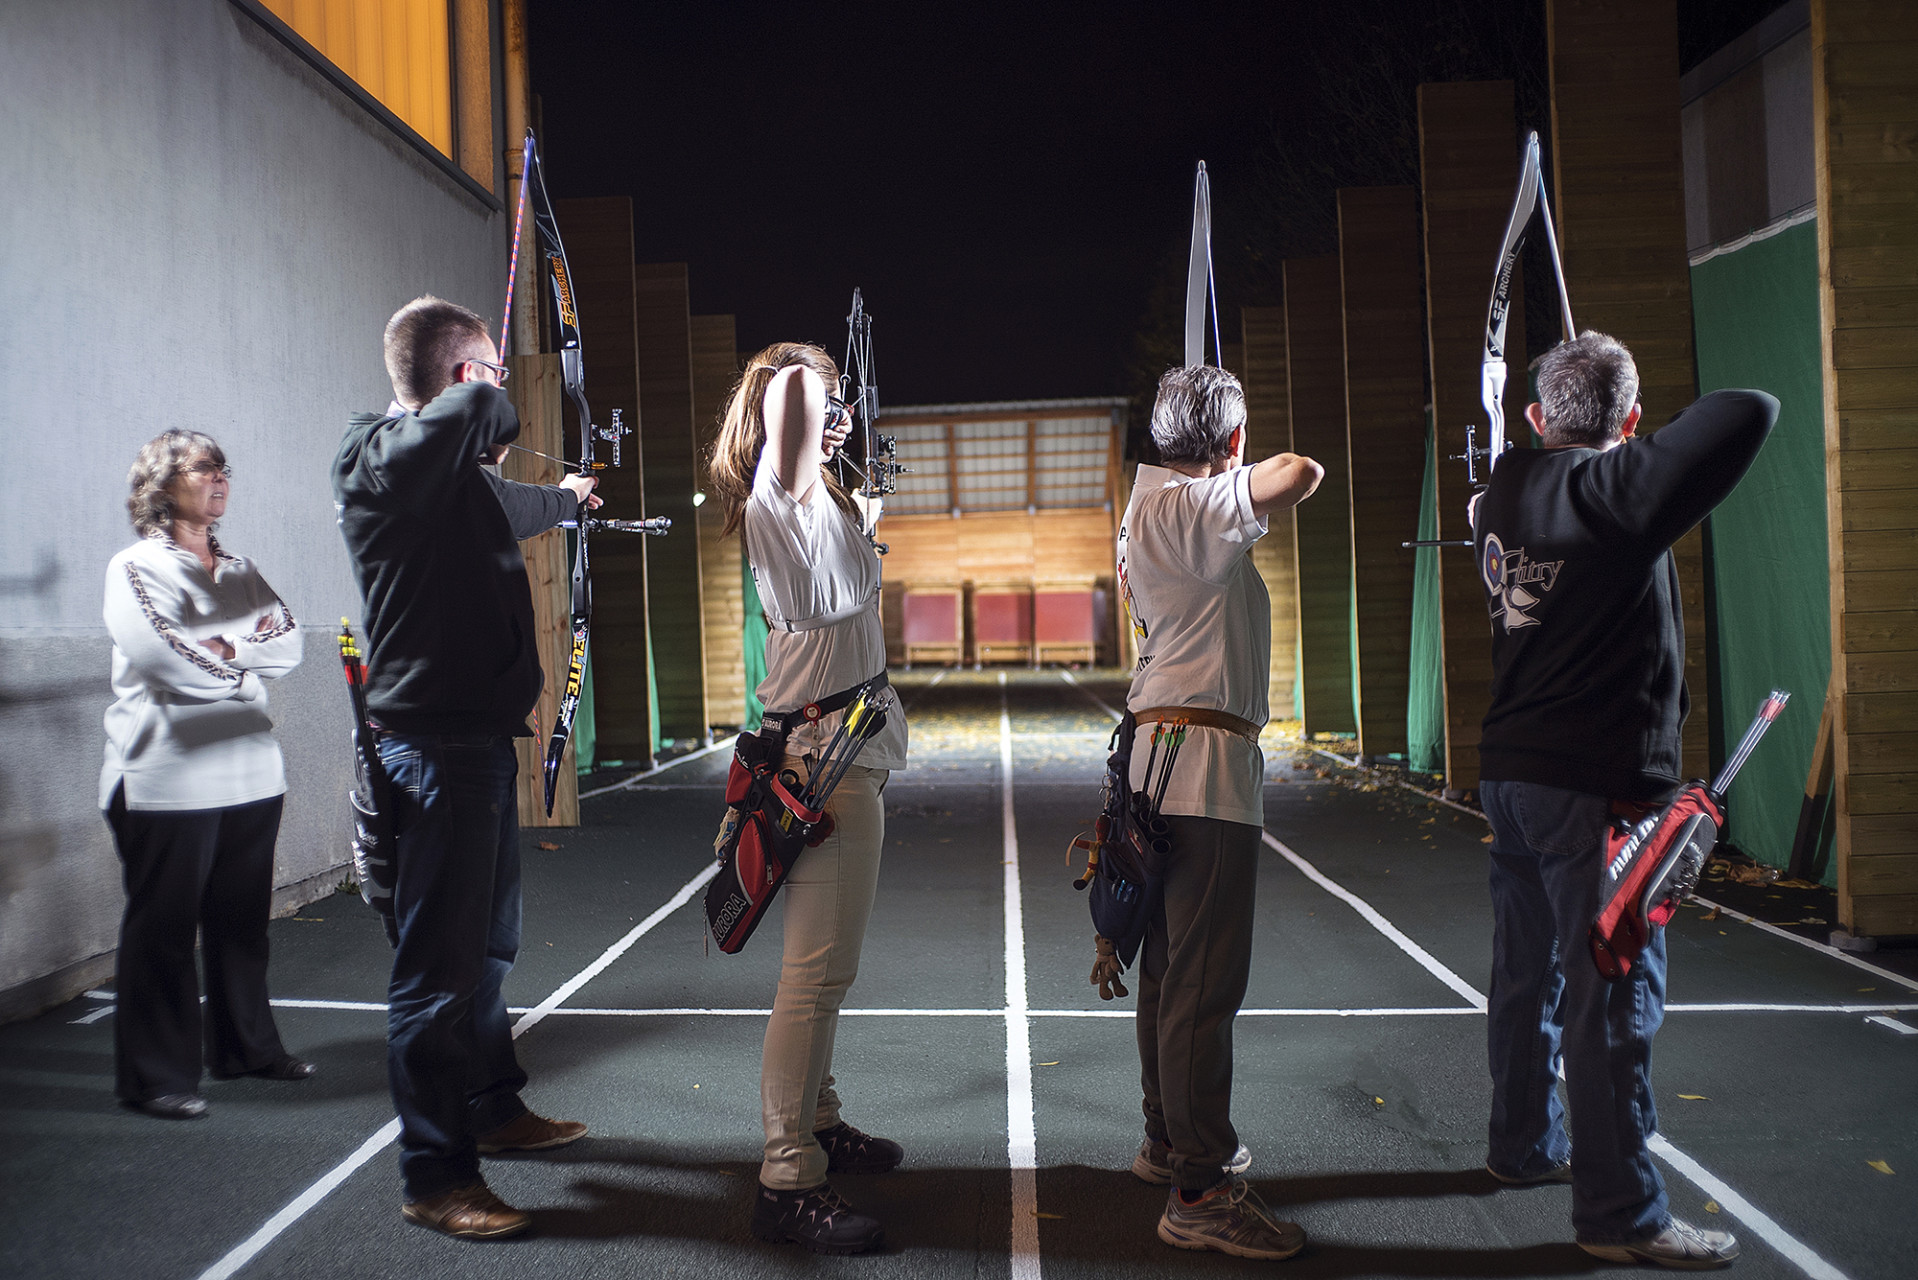 Club de tir à l'arc ESV